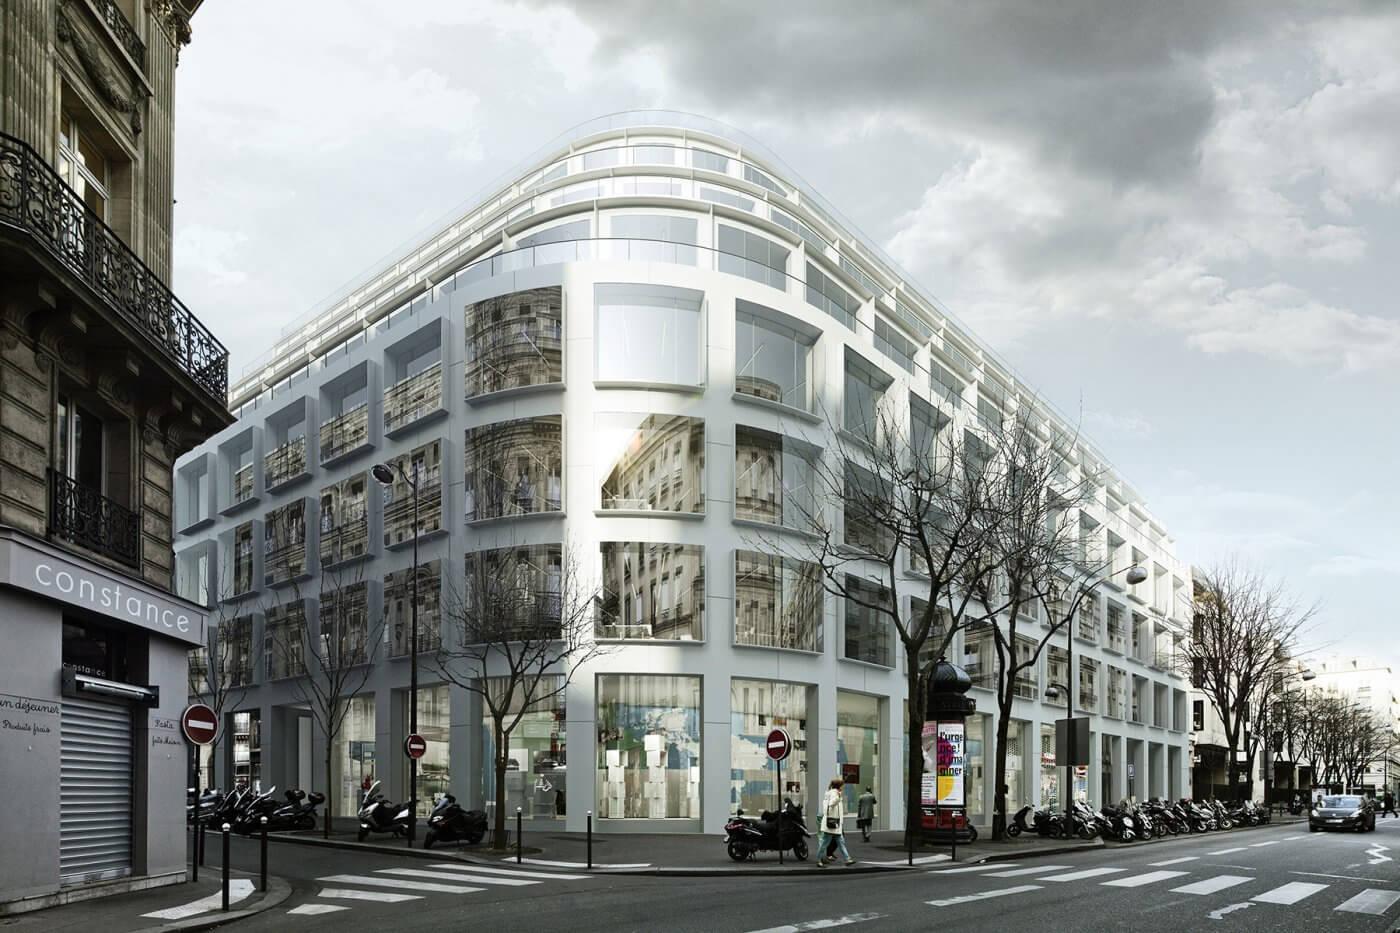 Paris – Bureaux SFL Cardinal (Paris 2014)